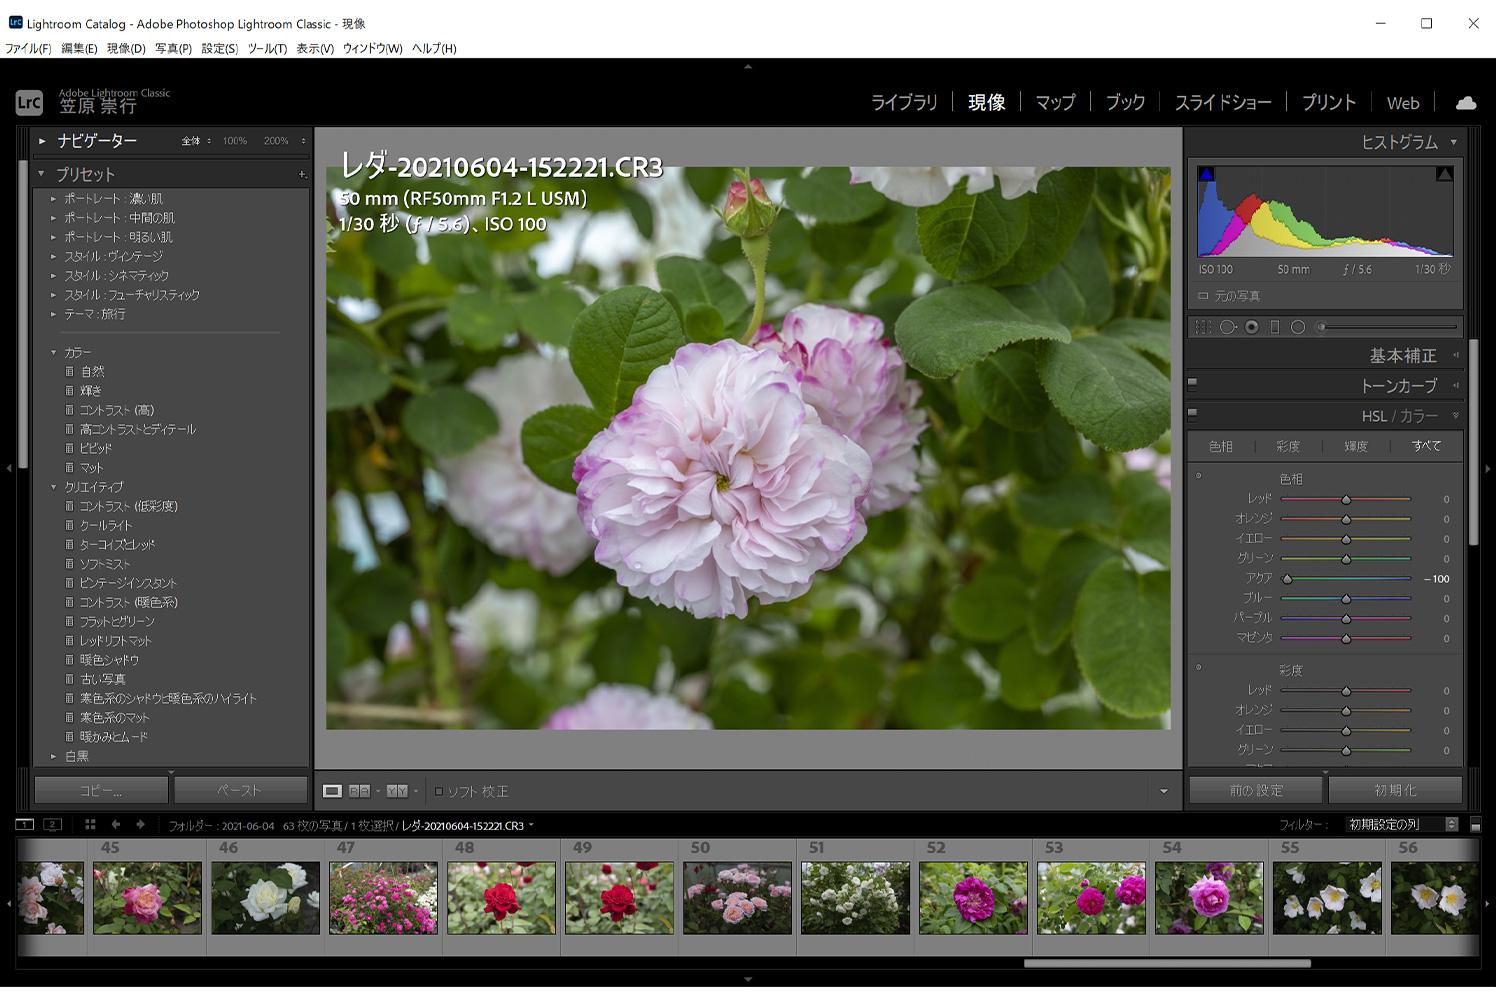 Adobe Lightroomによる現像作業